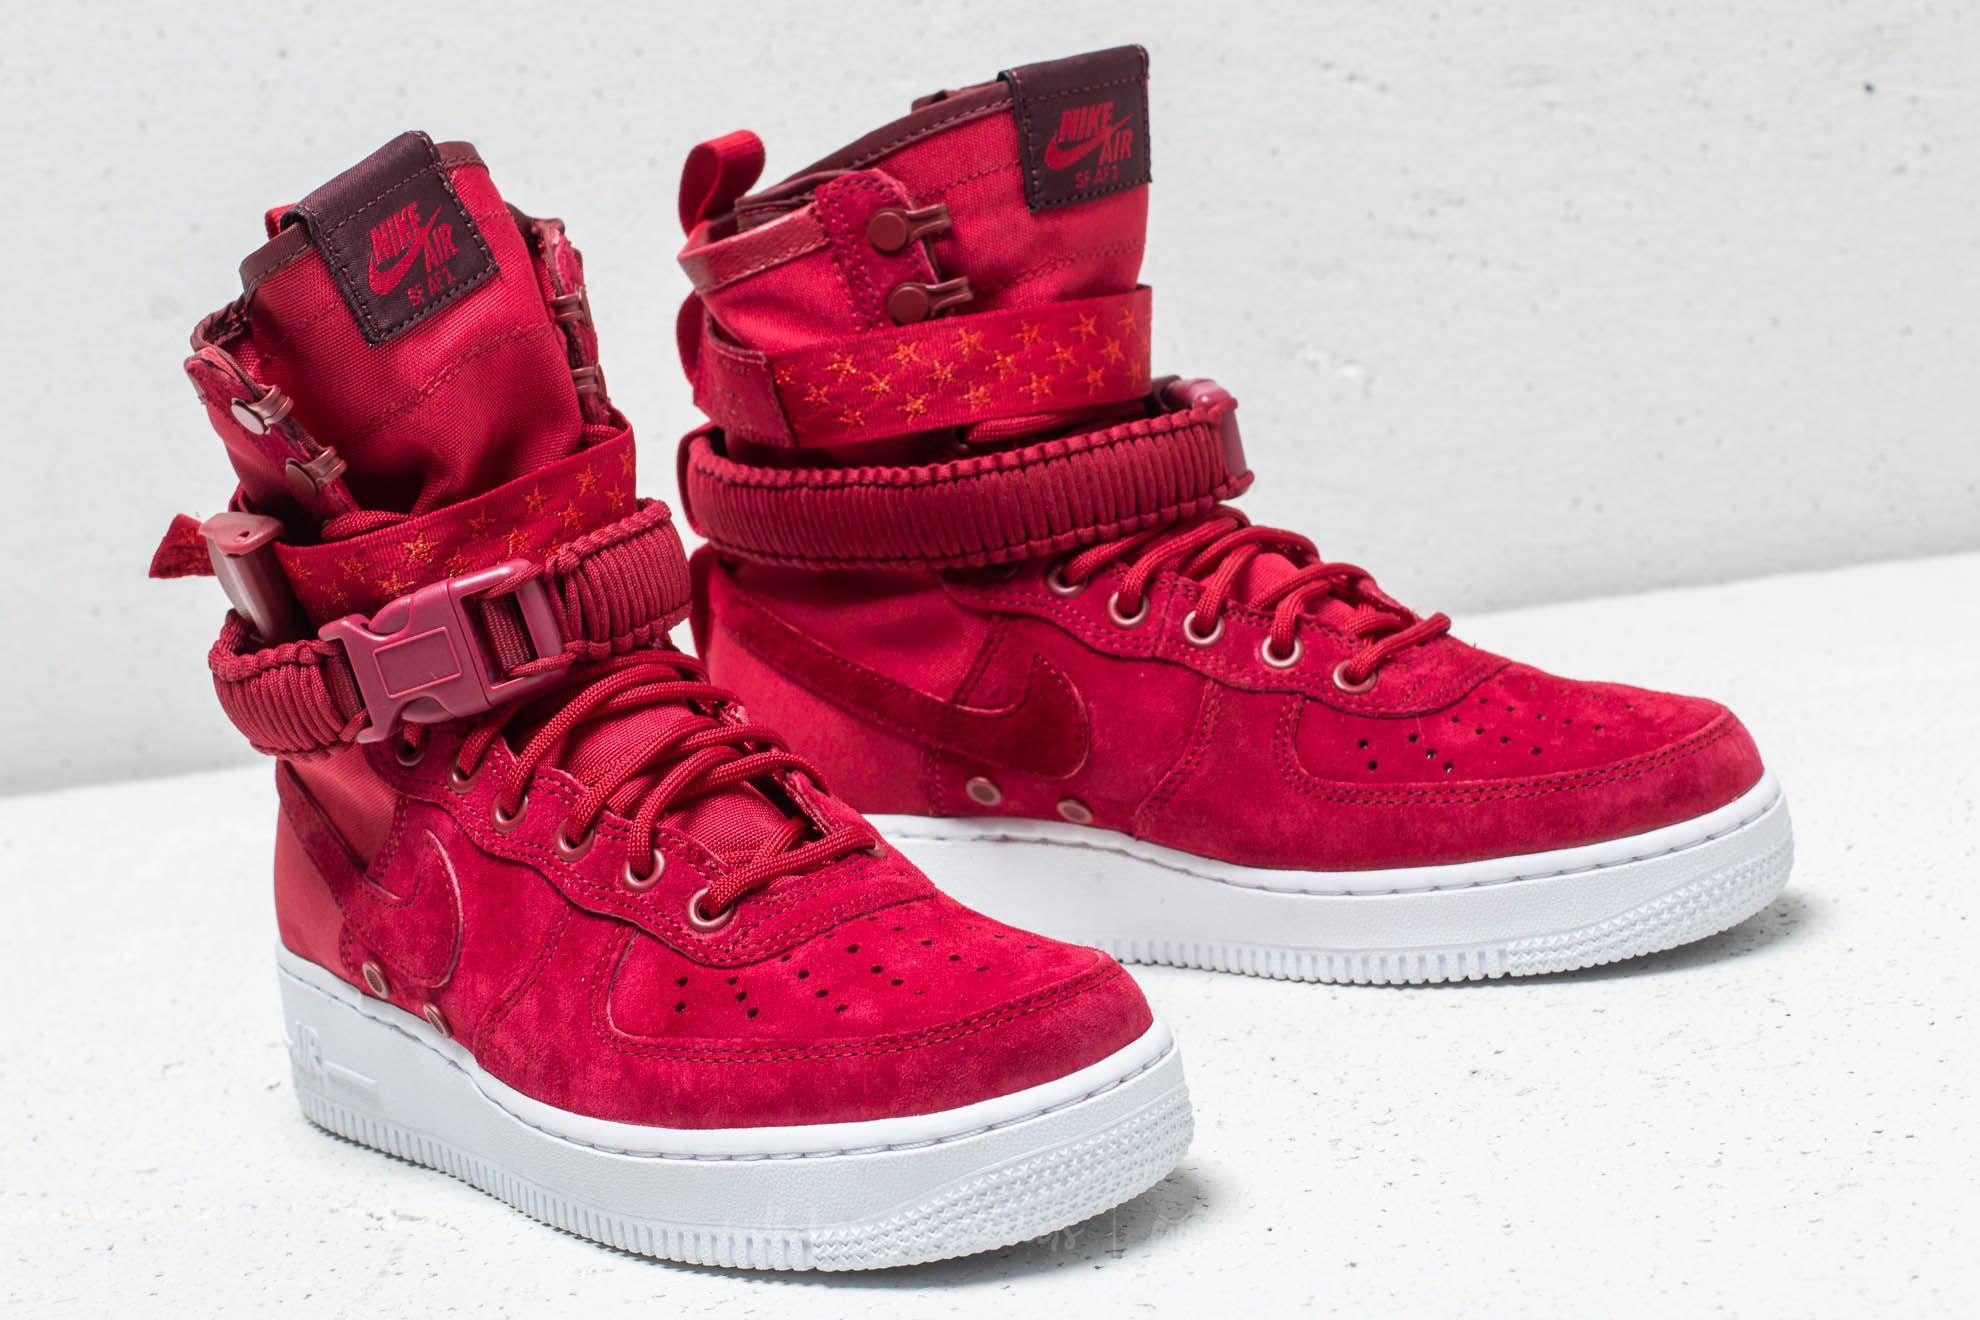 Nike SF Air Force 1 High: Red #sneakersnike | Sneakers